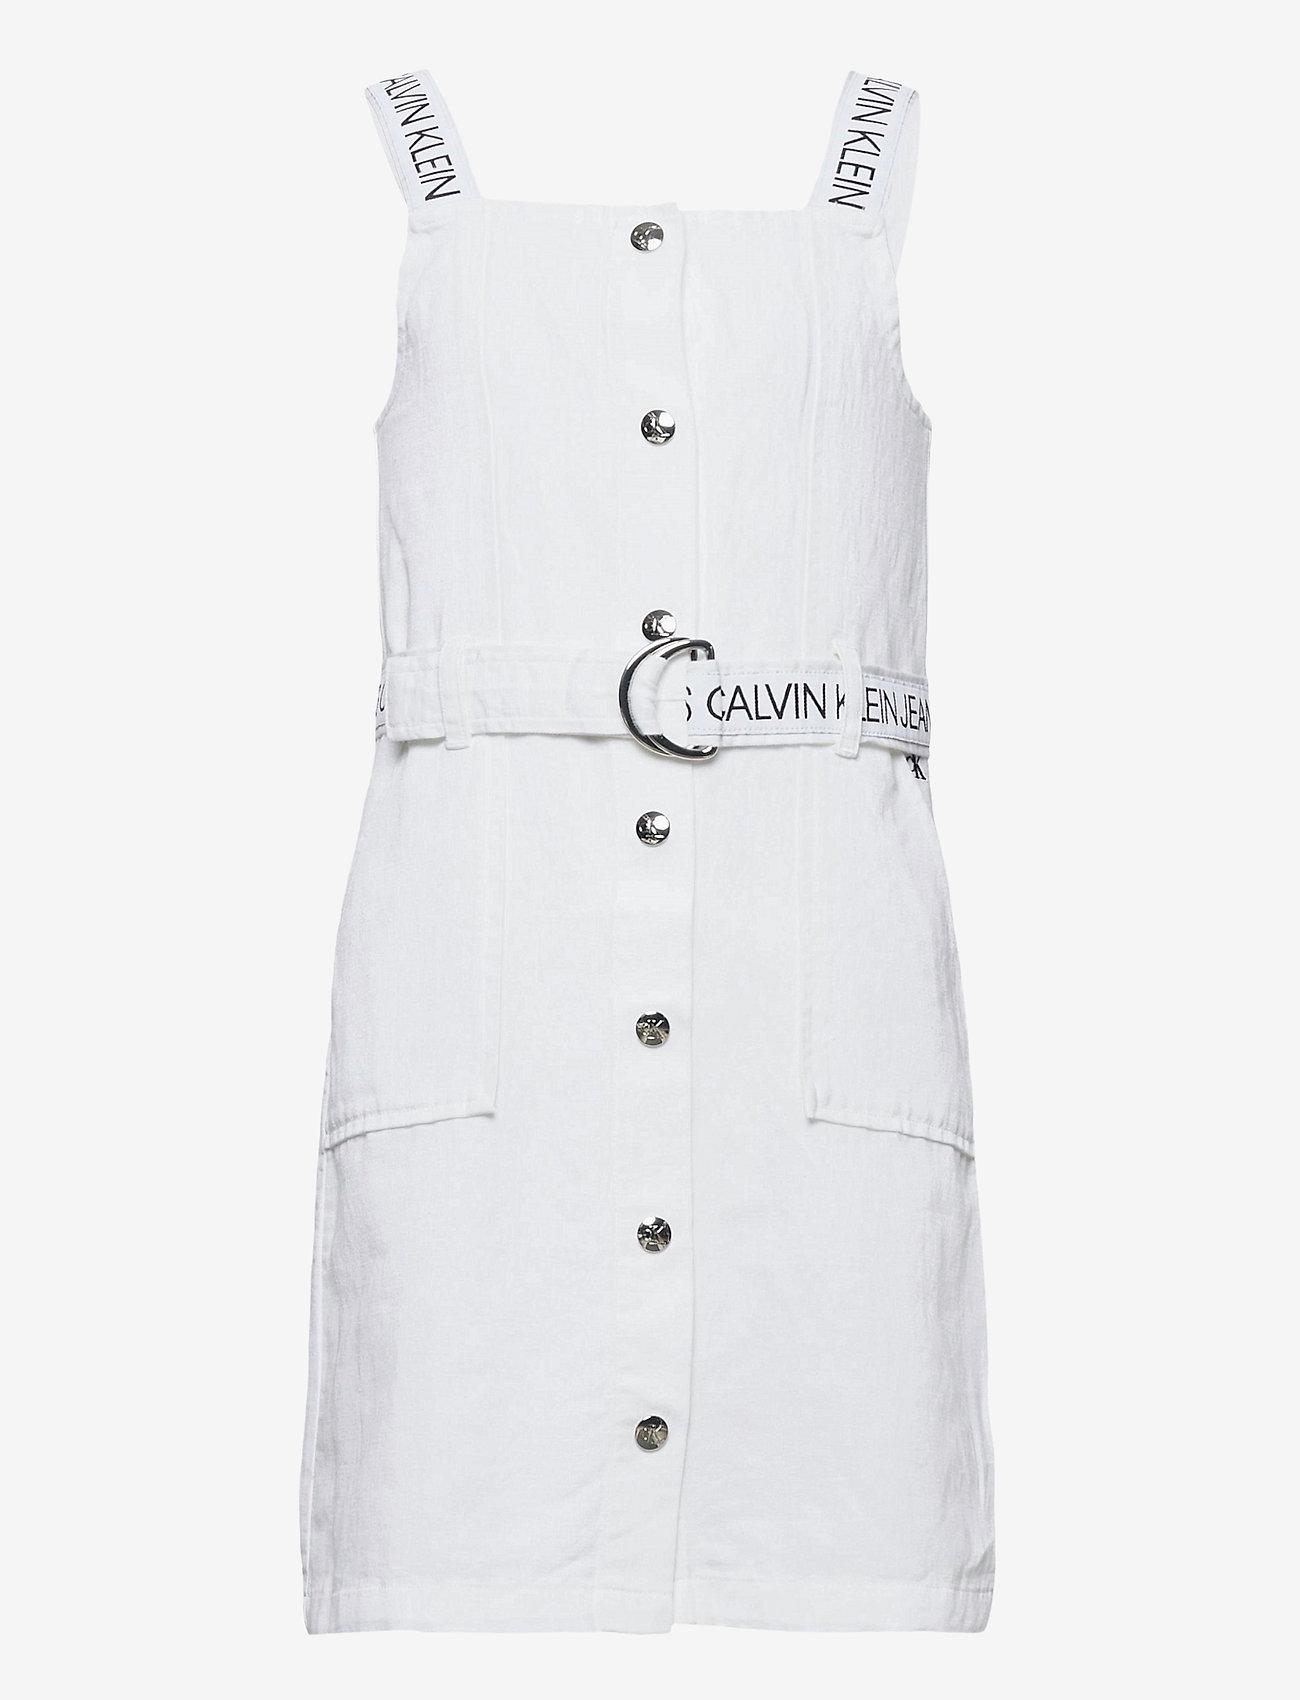 Calvin Klein - BUTTON DOWN LOGO STRAP DRESS - kleider - bright white - 0